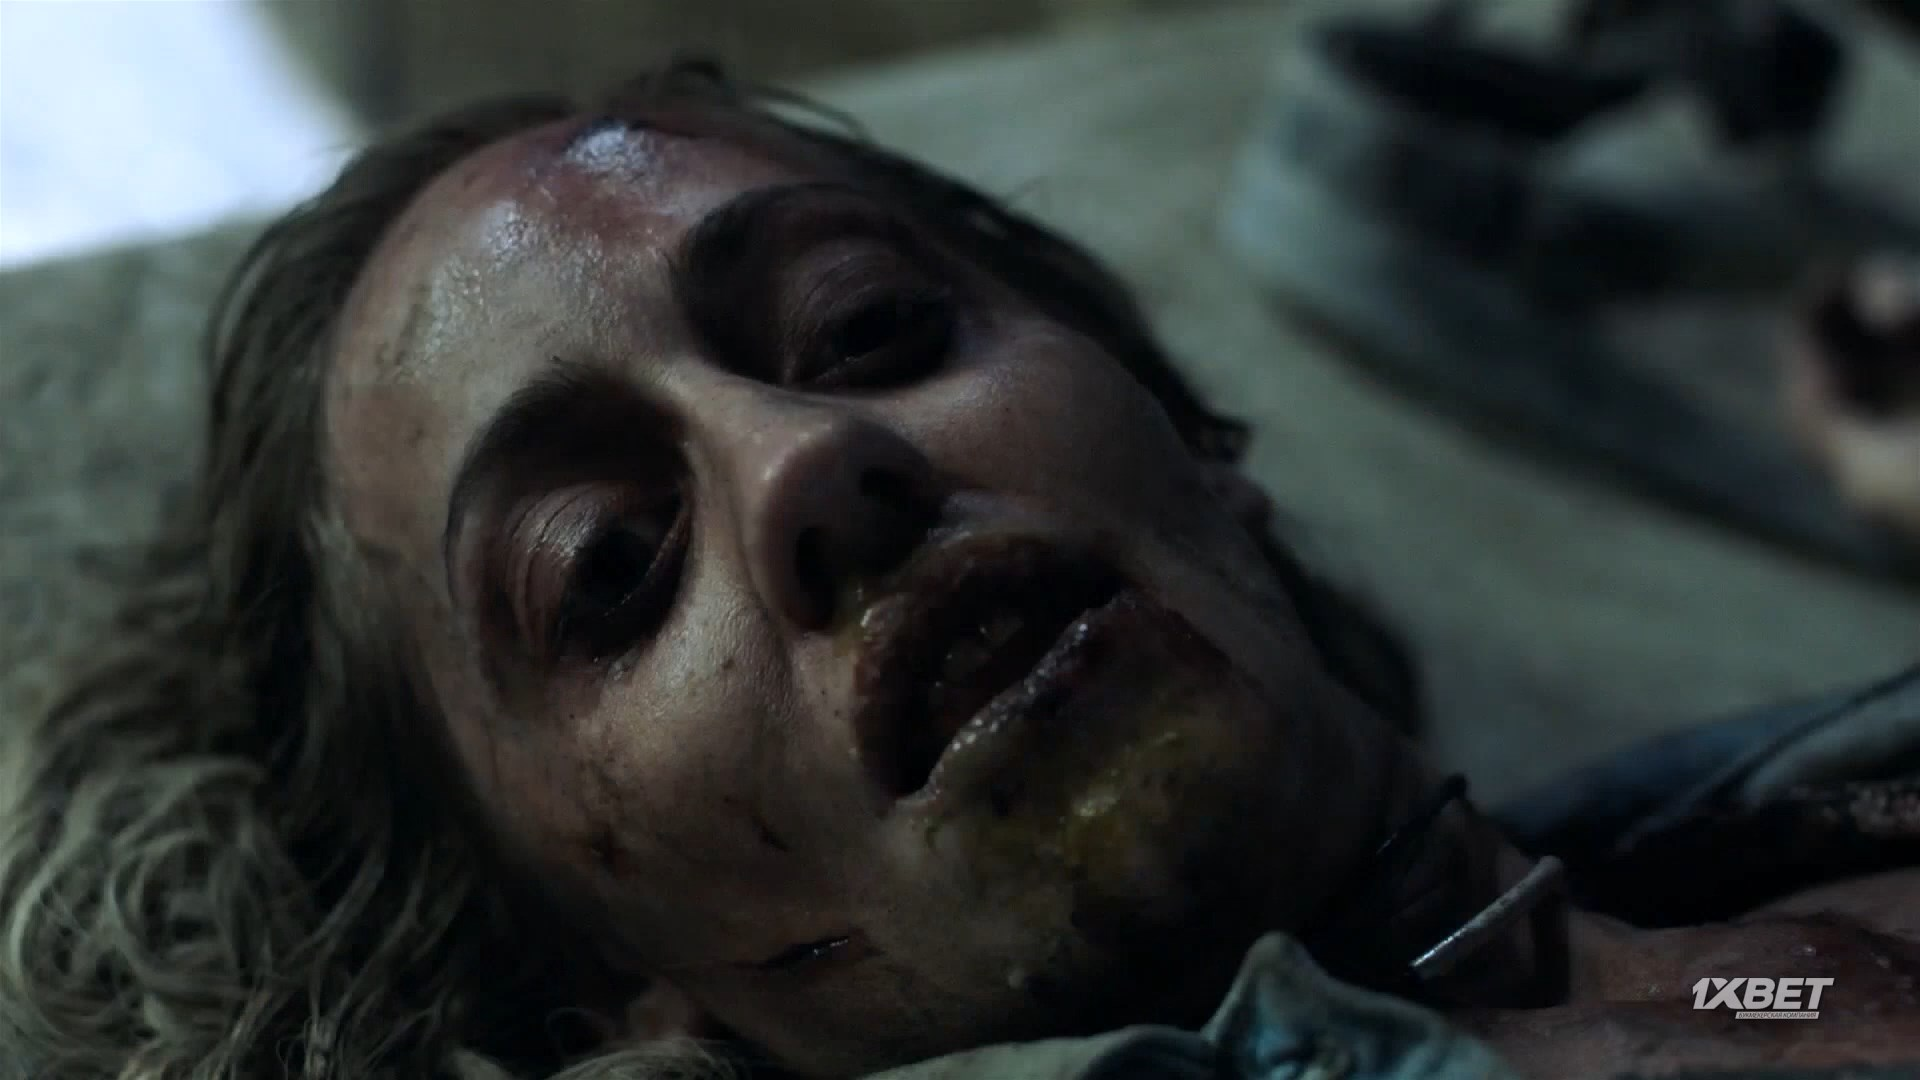 Изгоняющий дьявола / The Exorcist [02х01-06 из 10] (2017) WEB-DLRip 1080p | Profix Media